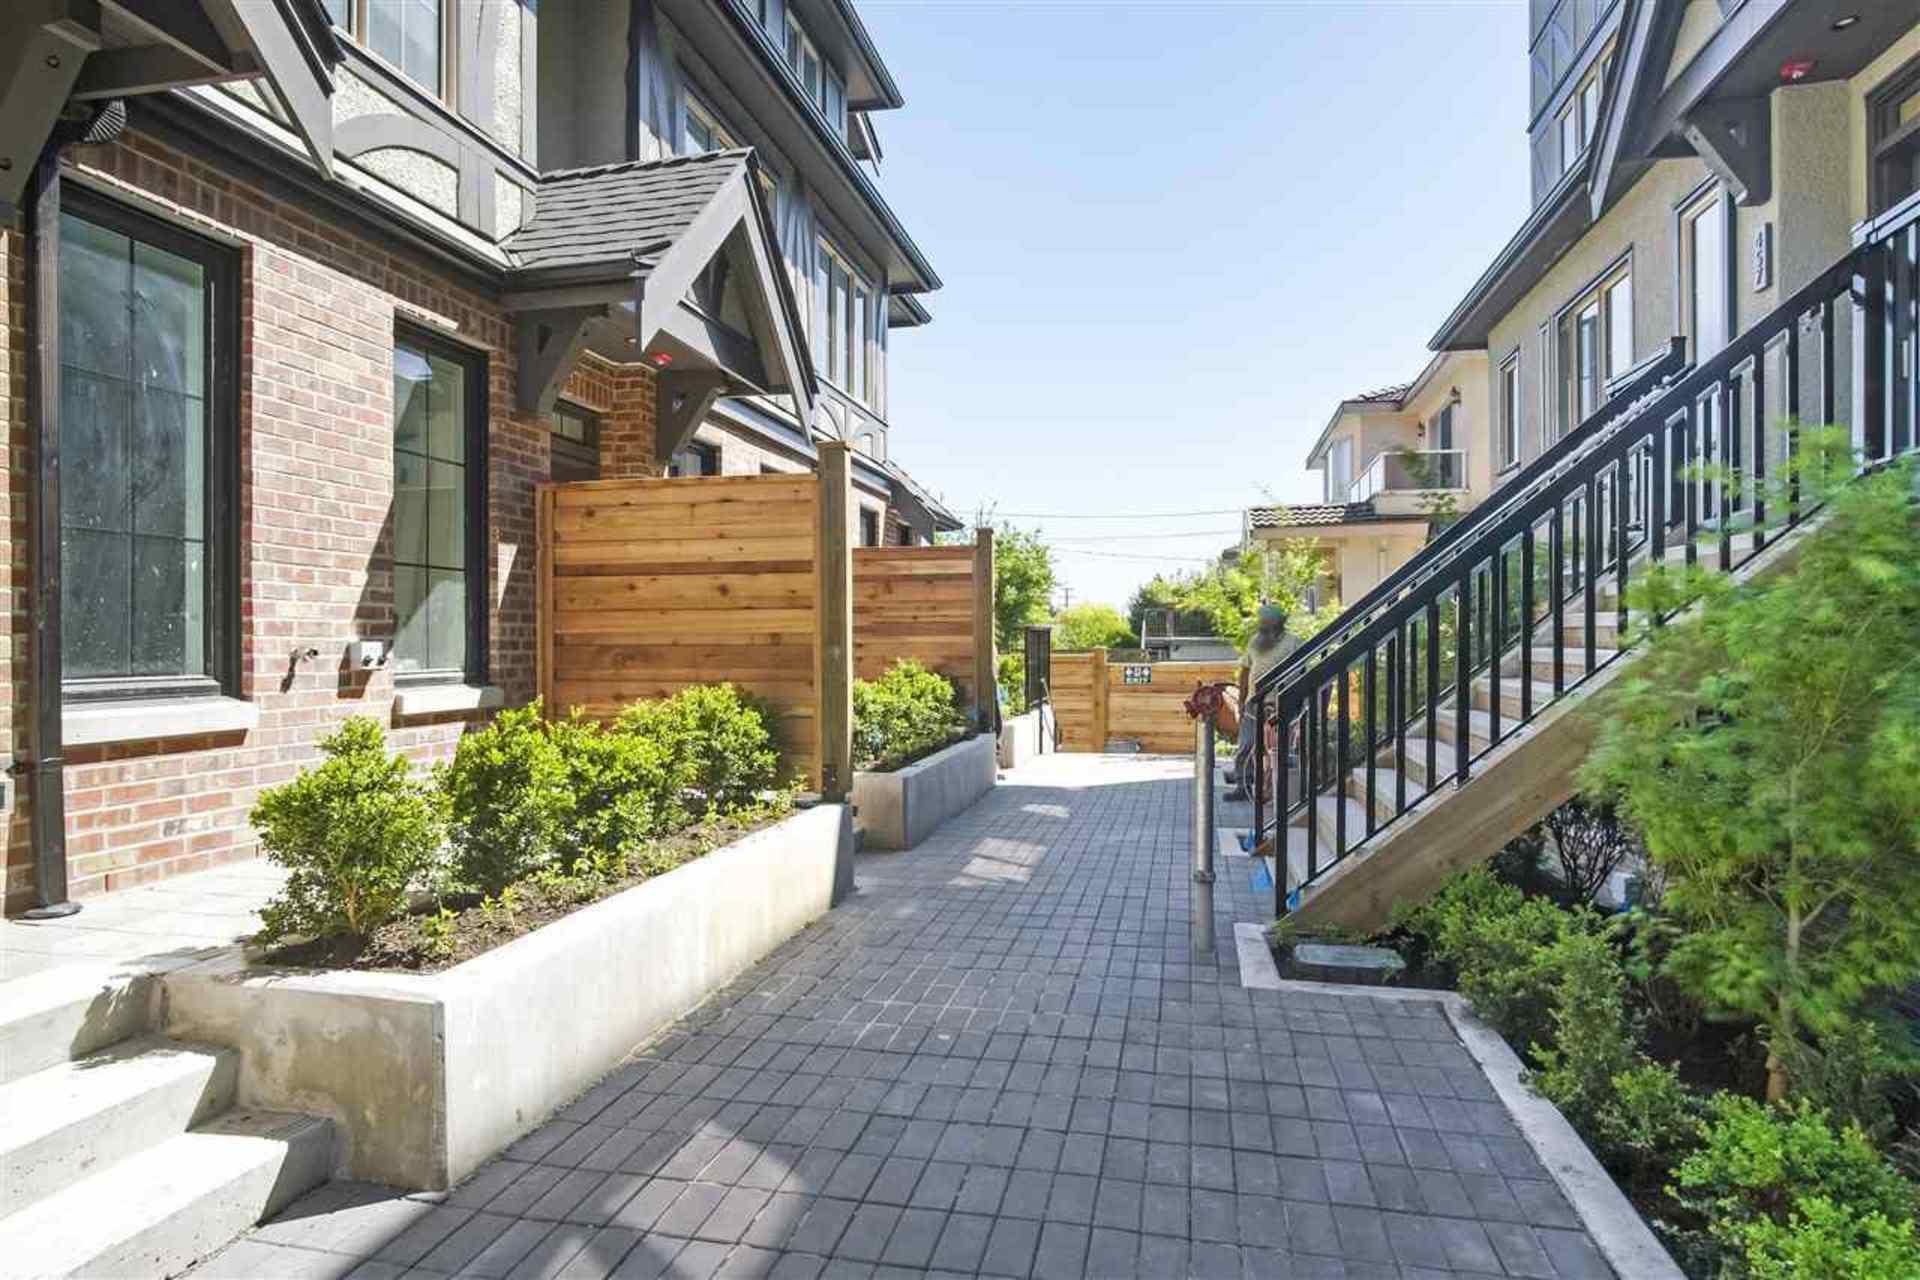 443-w-63-avenue-marpole-vancouver-west-02 at SL3 - 443 W 63 Avenue, Marpole, Vancouver West